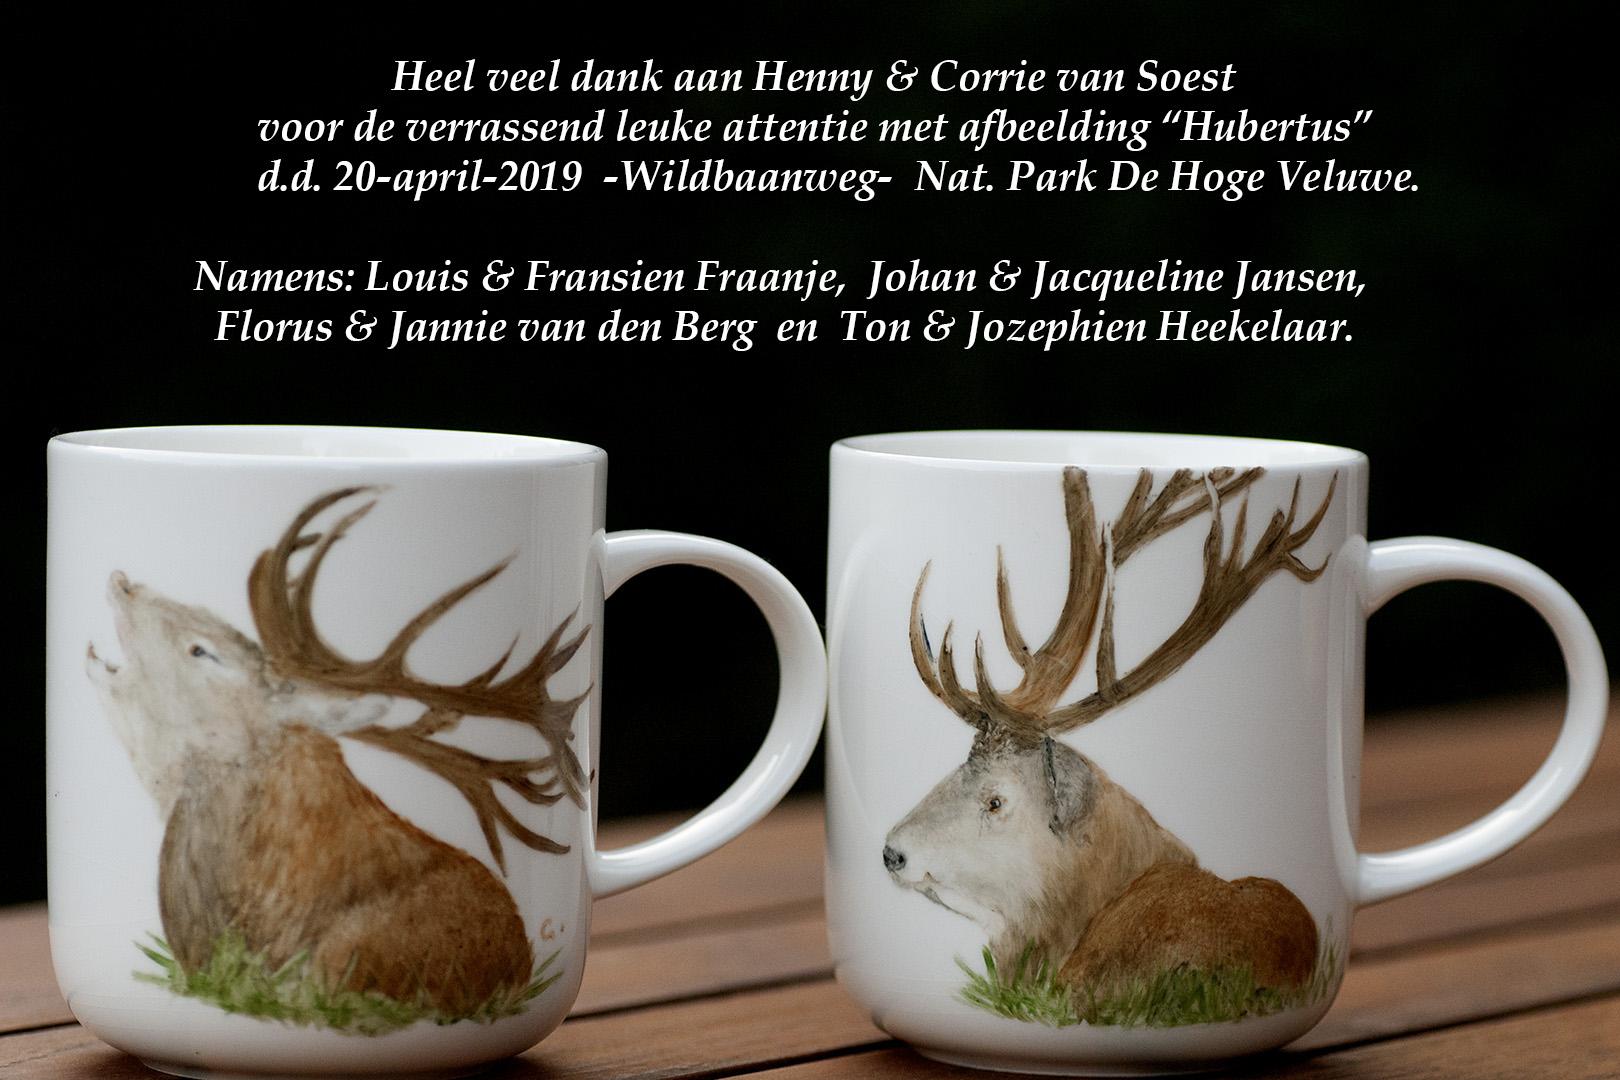 Samenstelling en fotografie - Foto: ©Ton Heekelaar